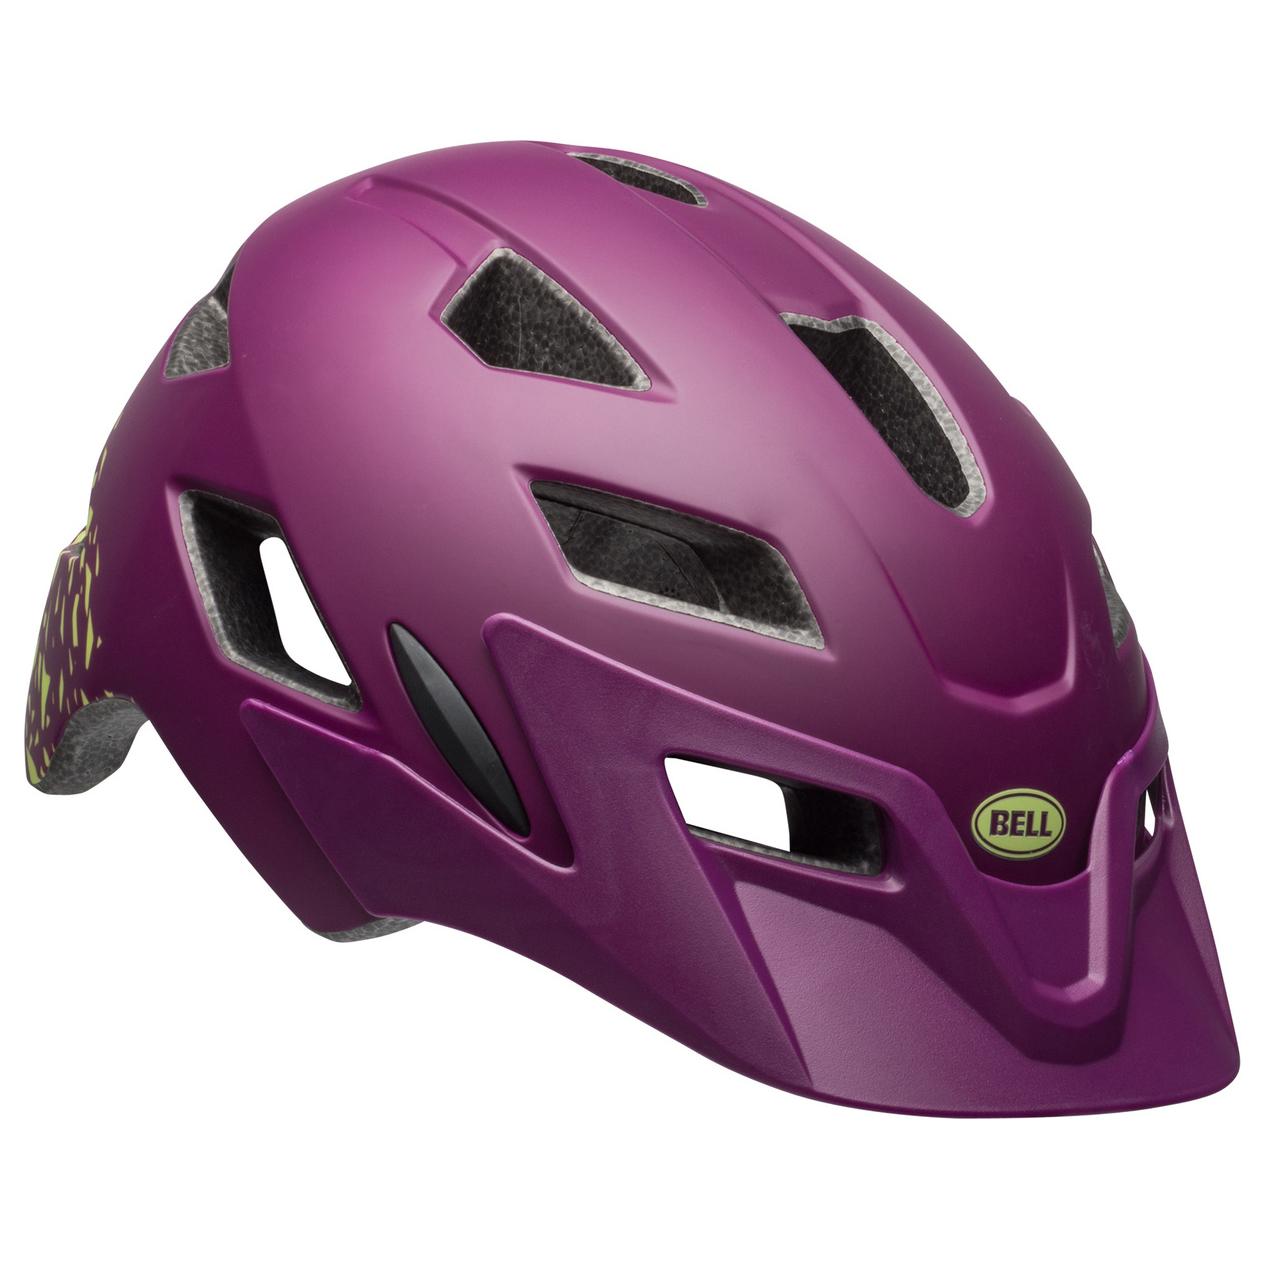 Bell Sidetrack Youth MIPS - Cykelhjälm Barn köp online  b83af184a8f5f